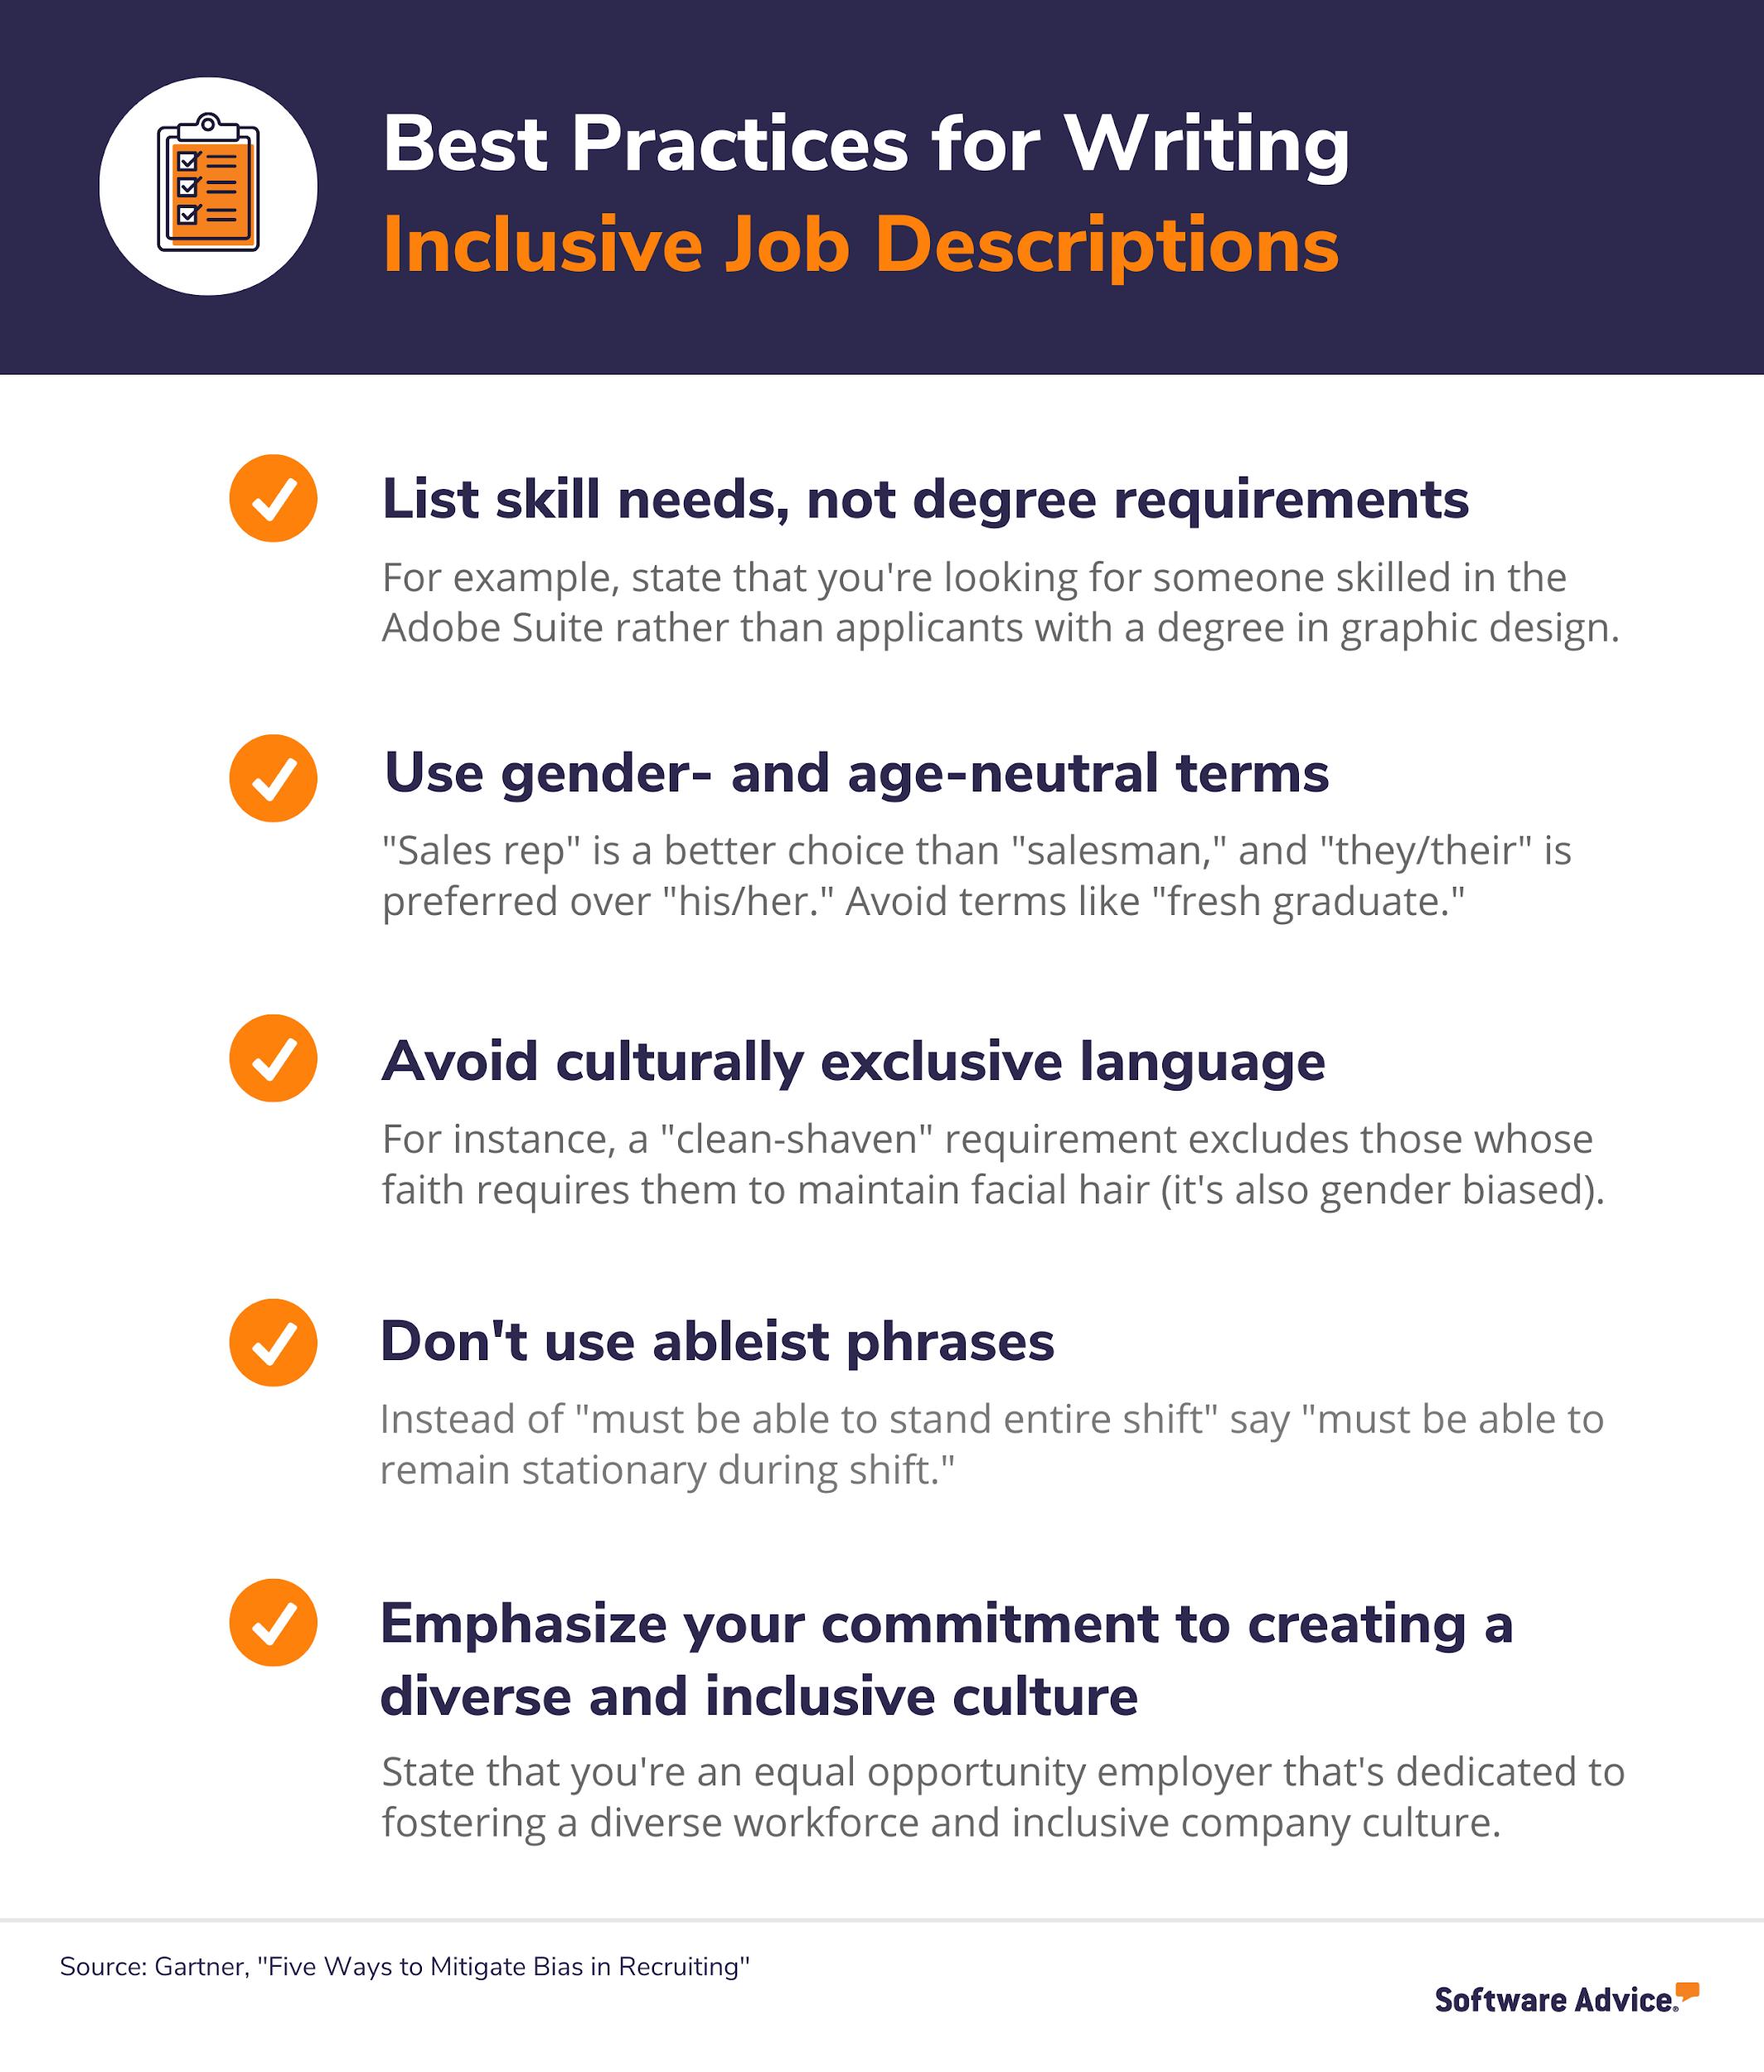 6 tips for writing inclusive job descriptions